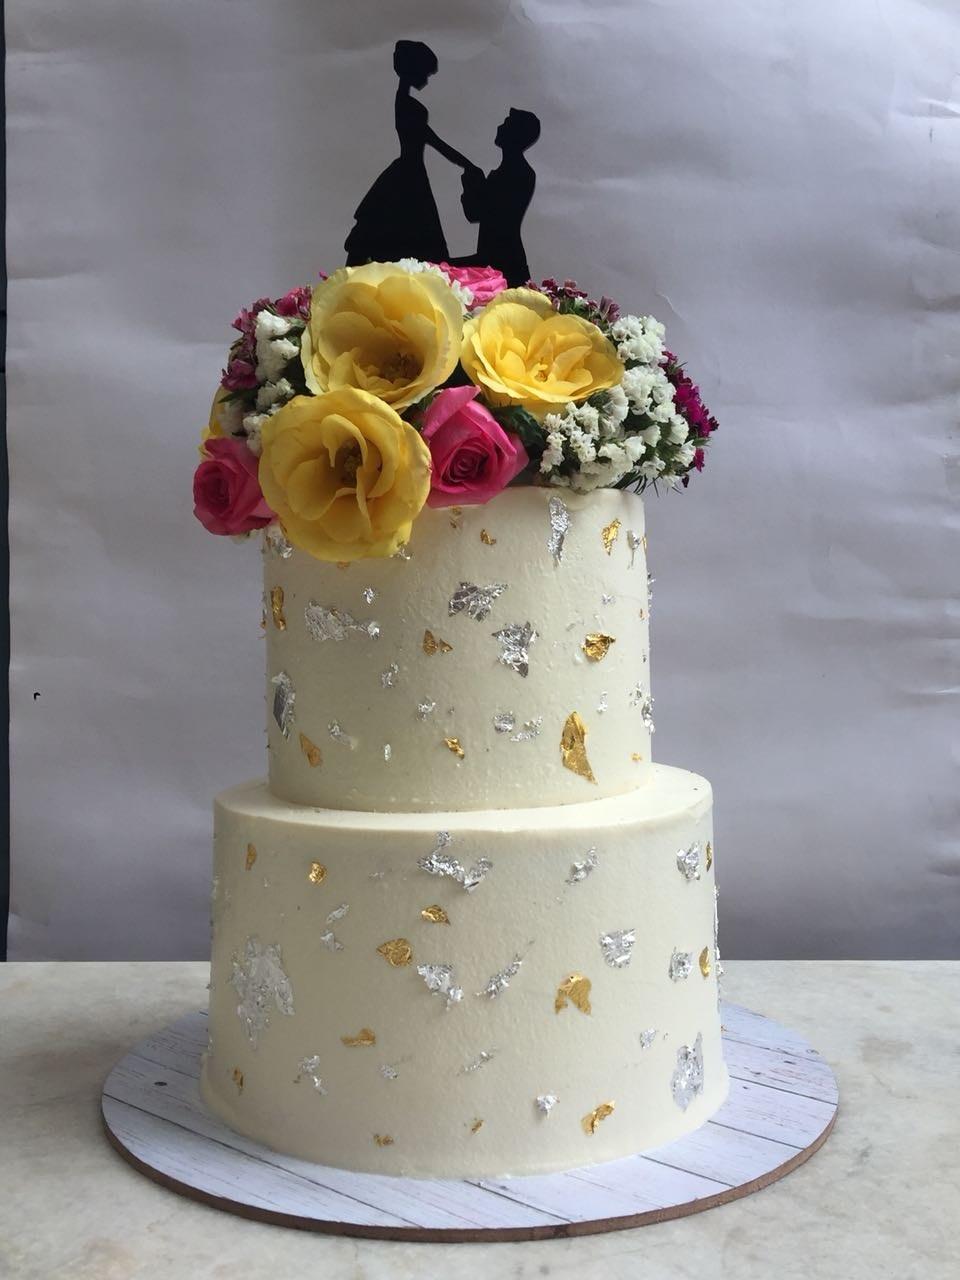 Portfolio - The Cake Company